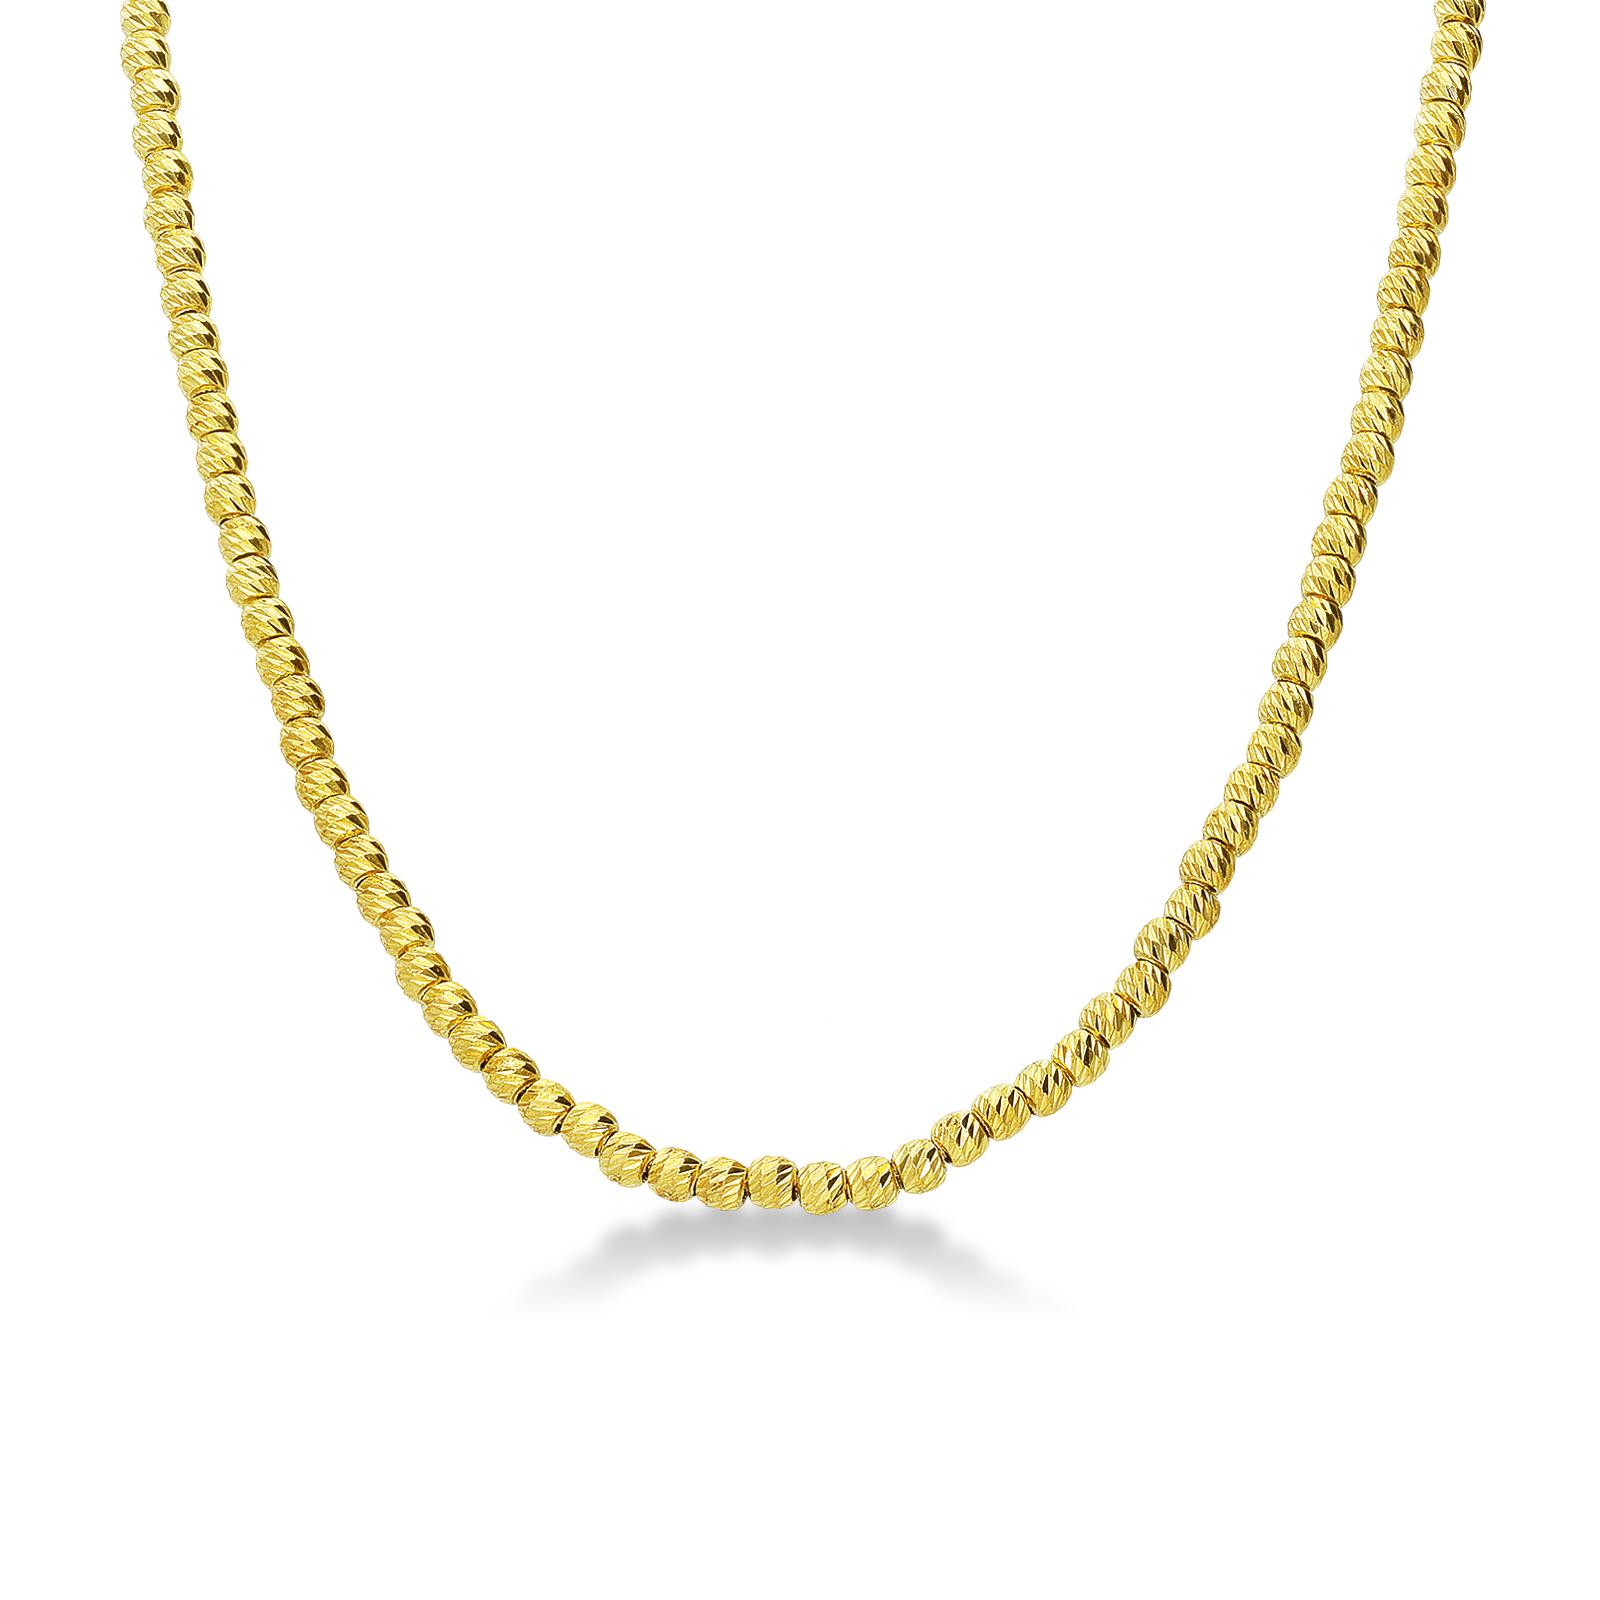 Collana girocollo palline diamantate in oro giallo 18kt